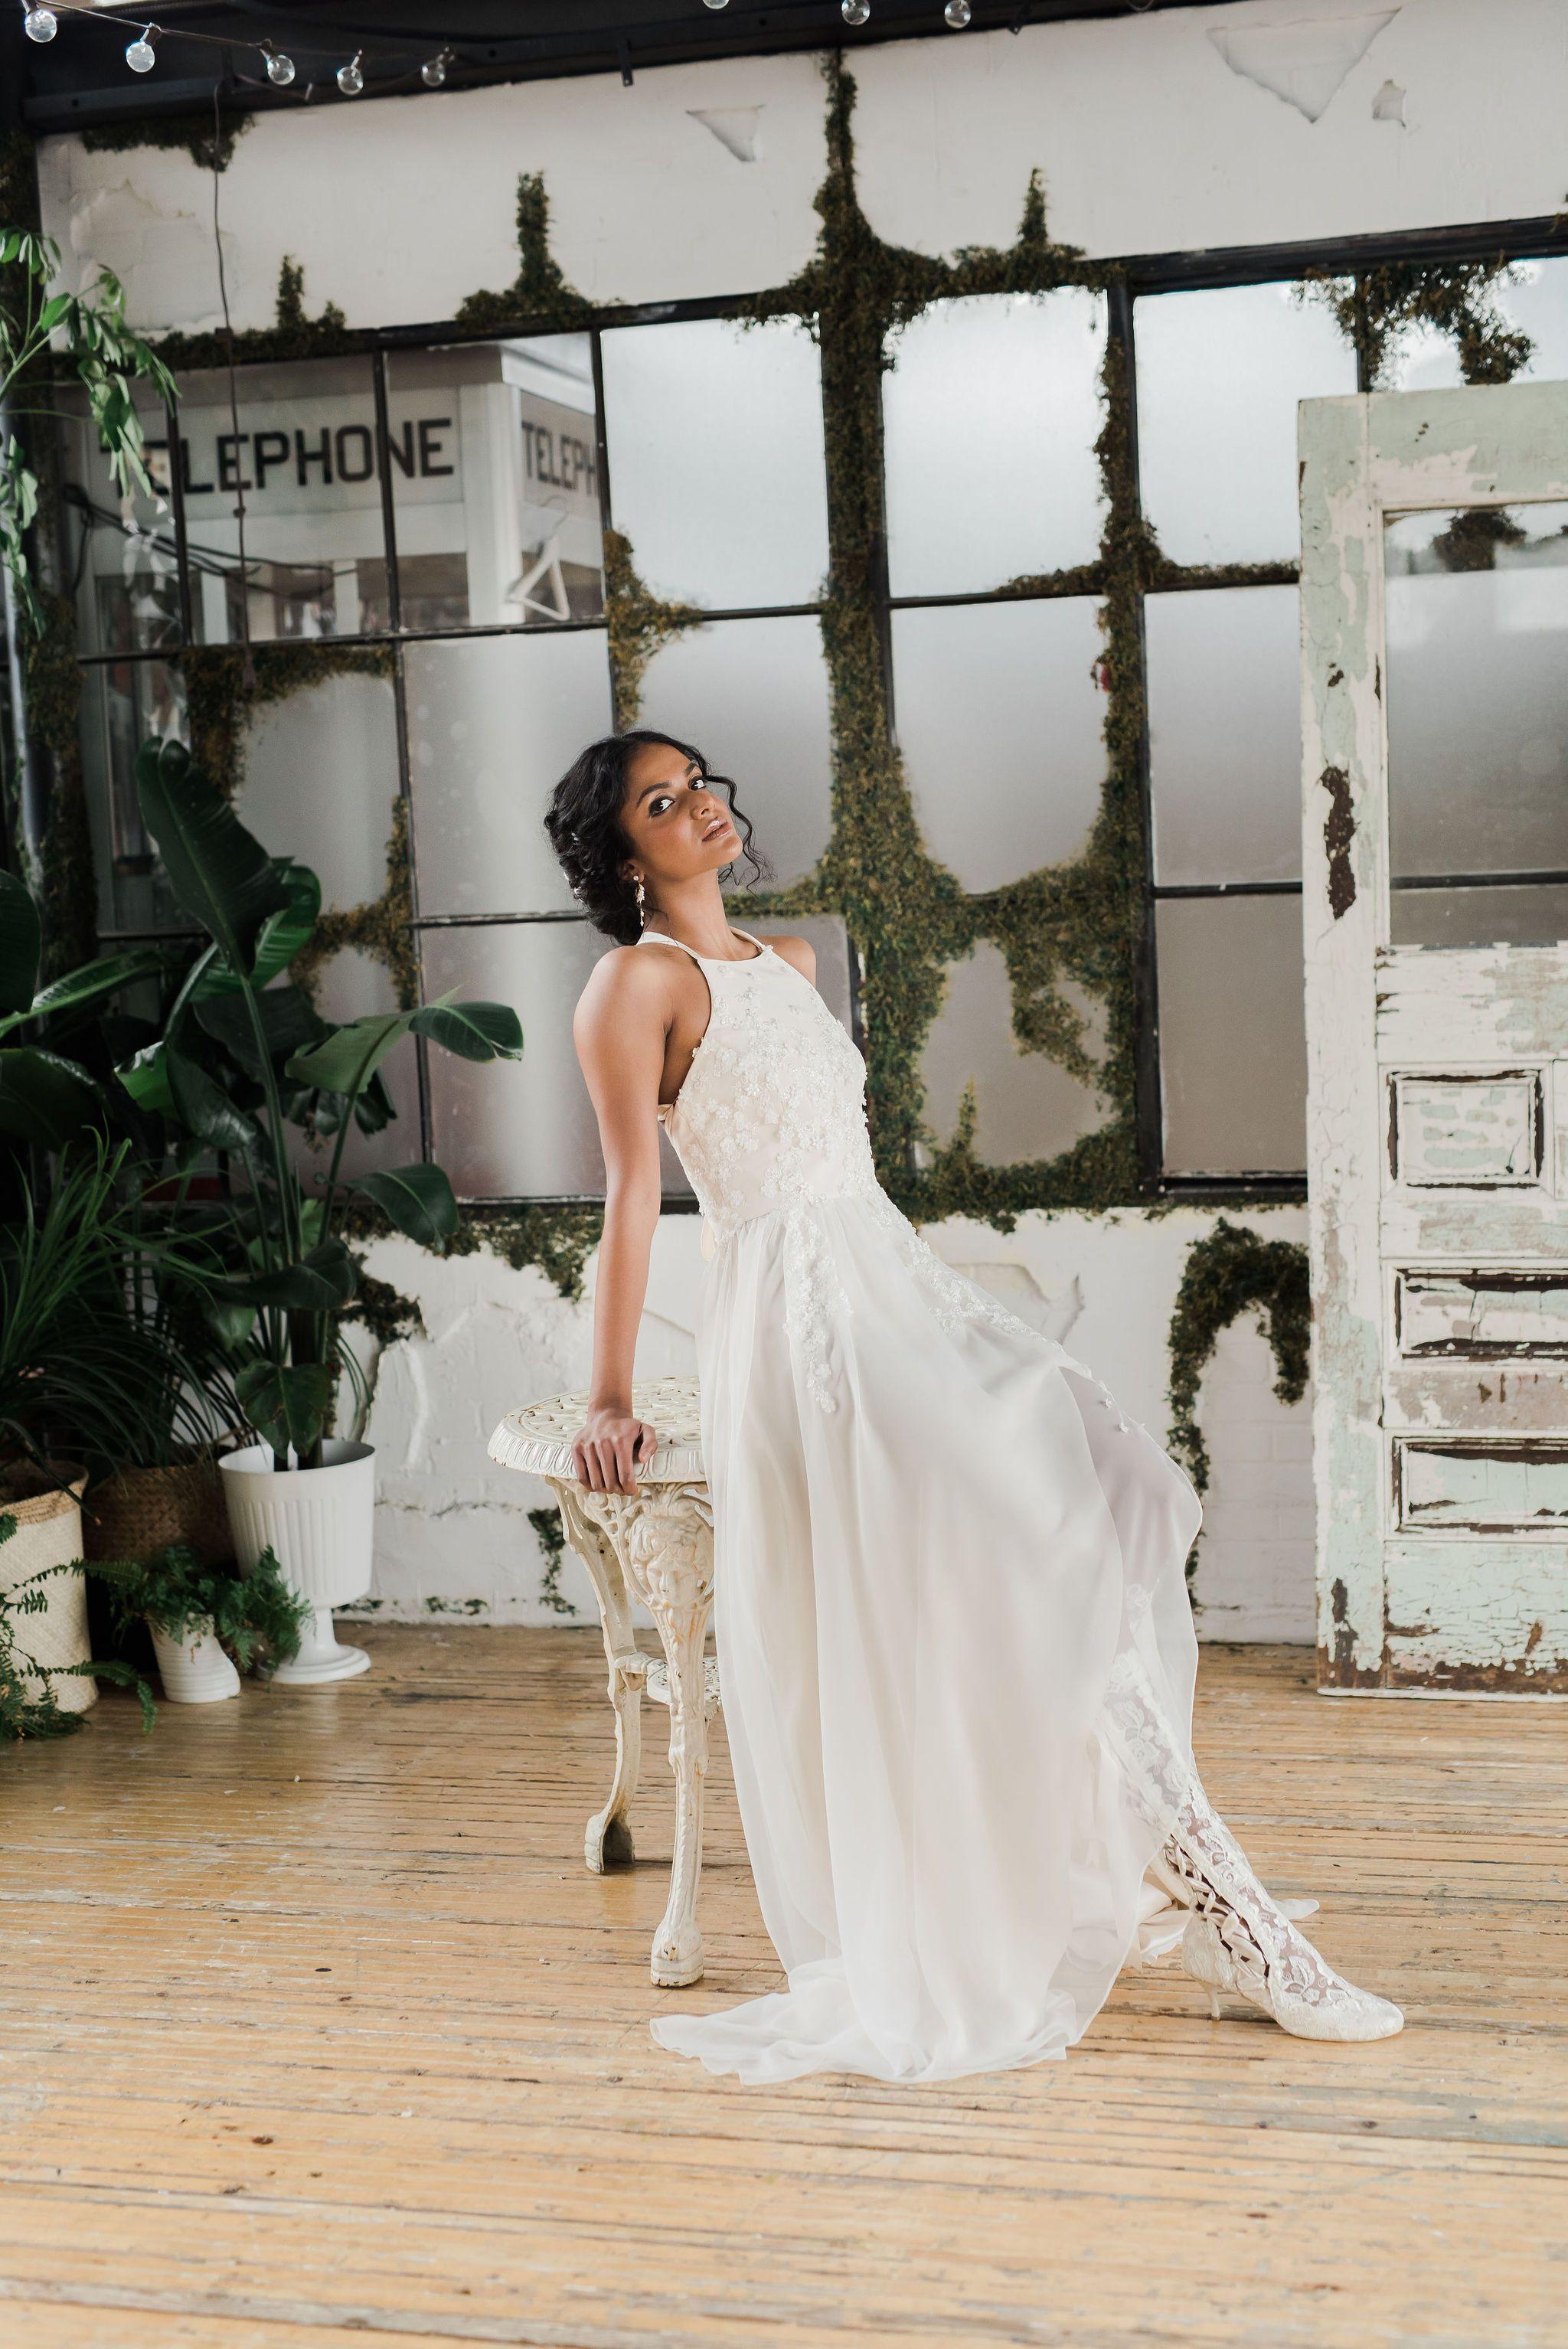 Halter Neck Wedding Dress Sargasso Halter Top Wedding Dress Halter Wedding Dress Lace Short Girl Wedding Dress [ 3068 x 2048 Pixel ]